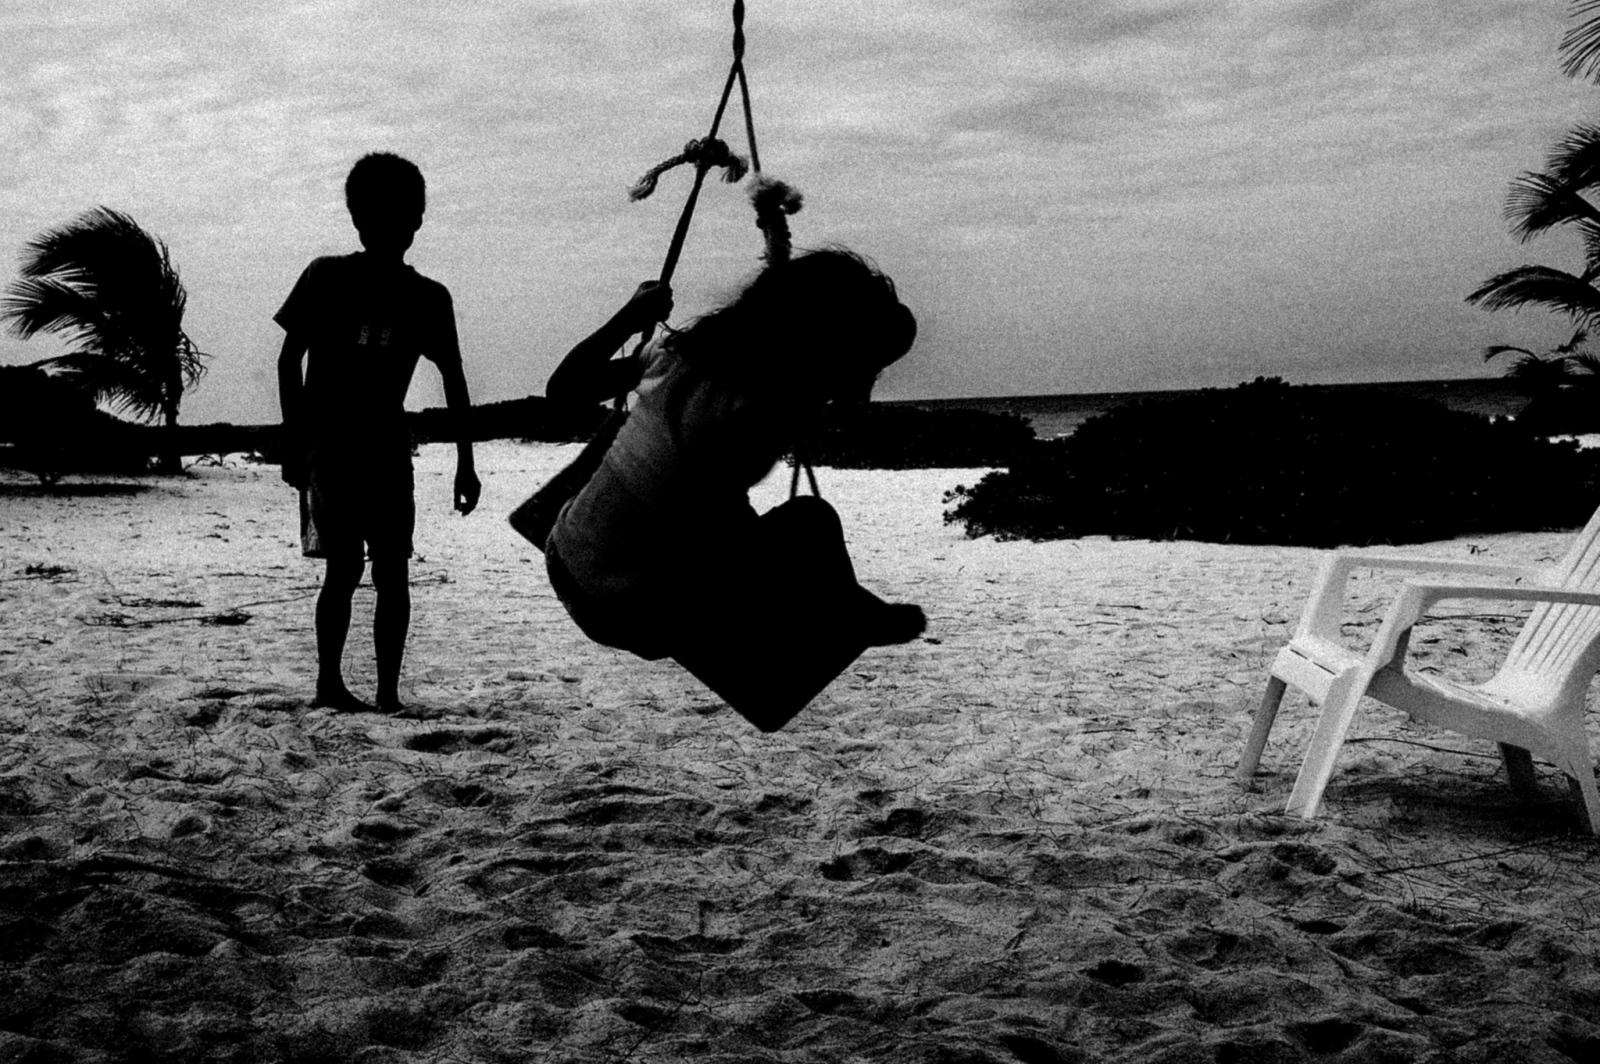 Art and Documentary Photography - Loading 19798385361_6c6578ceaf_k.jpg